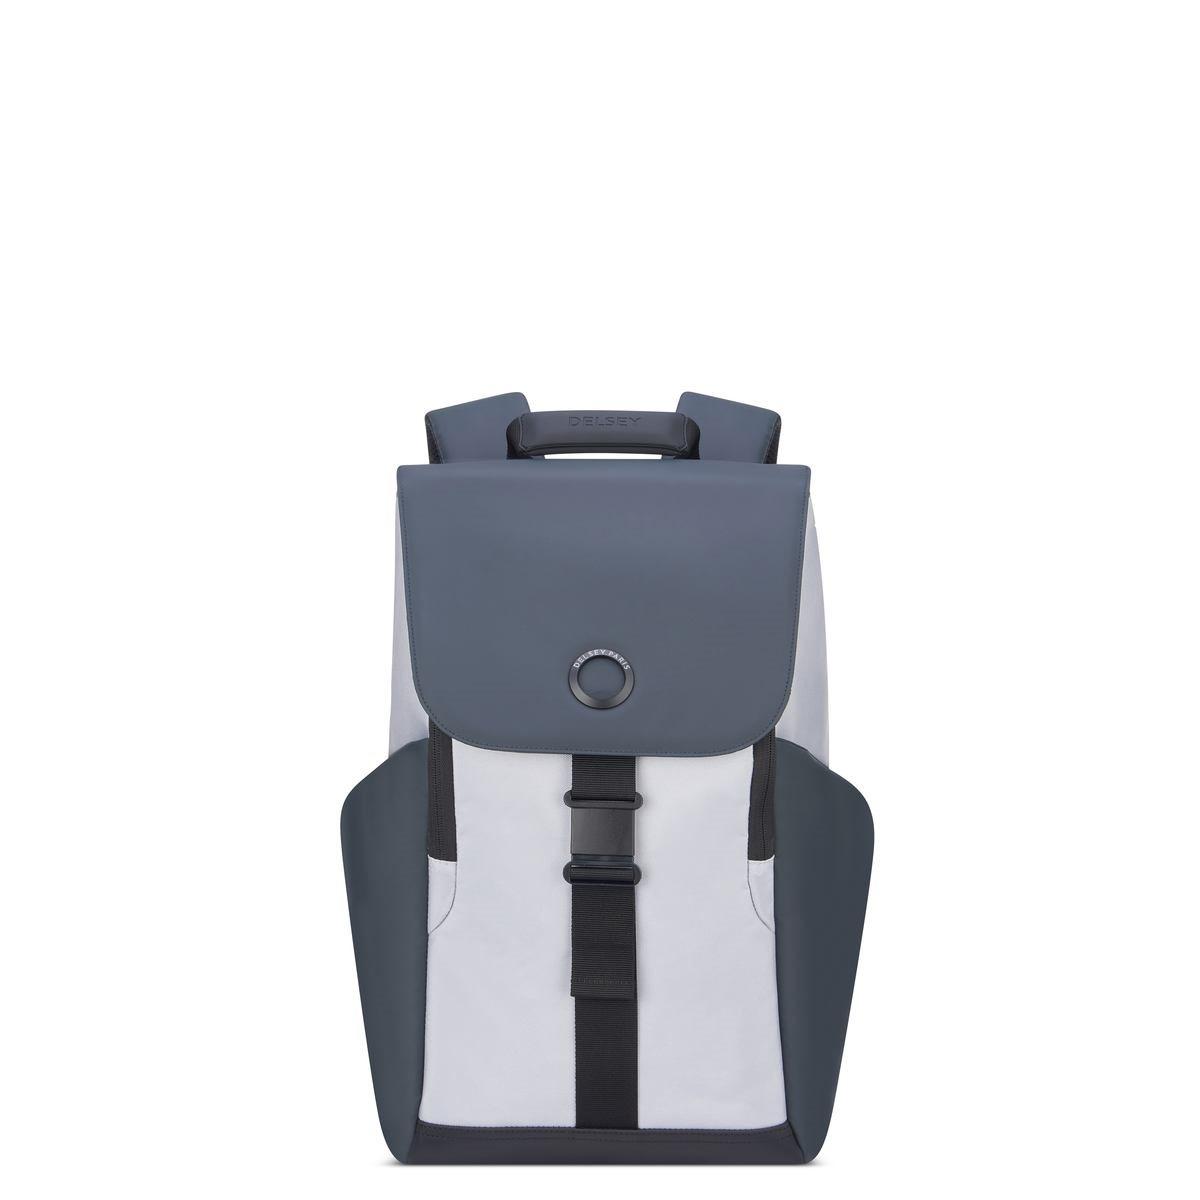 Delsey Σακίδιο πλάτης με θέση PC 15,6'' 45,5x31,5x14,5cm σειρά Securflap Silver